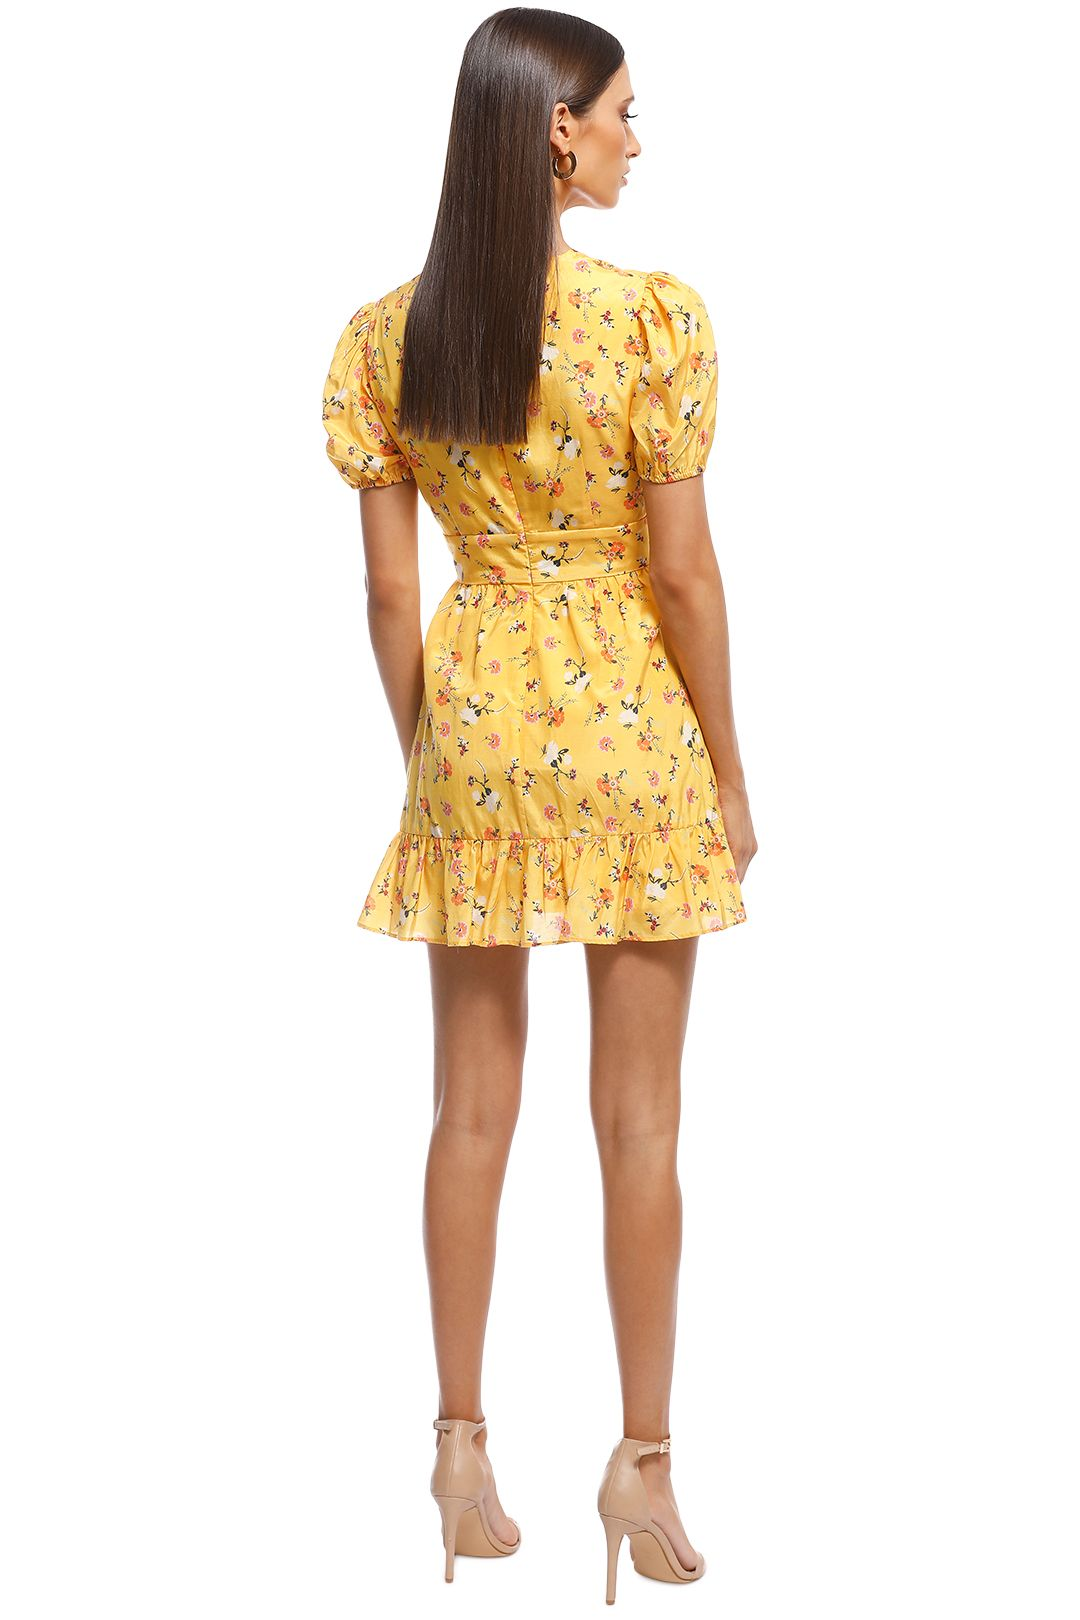 Talulah - Tansy Mini Dress - Yellow - Back